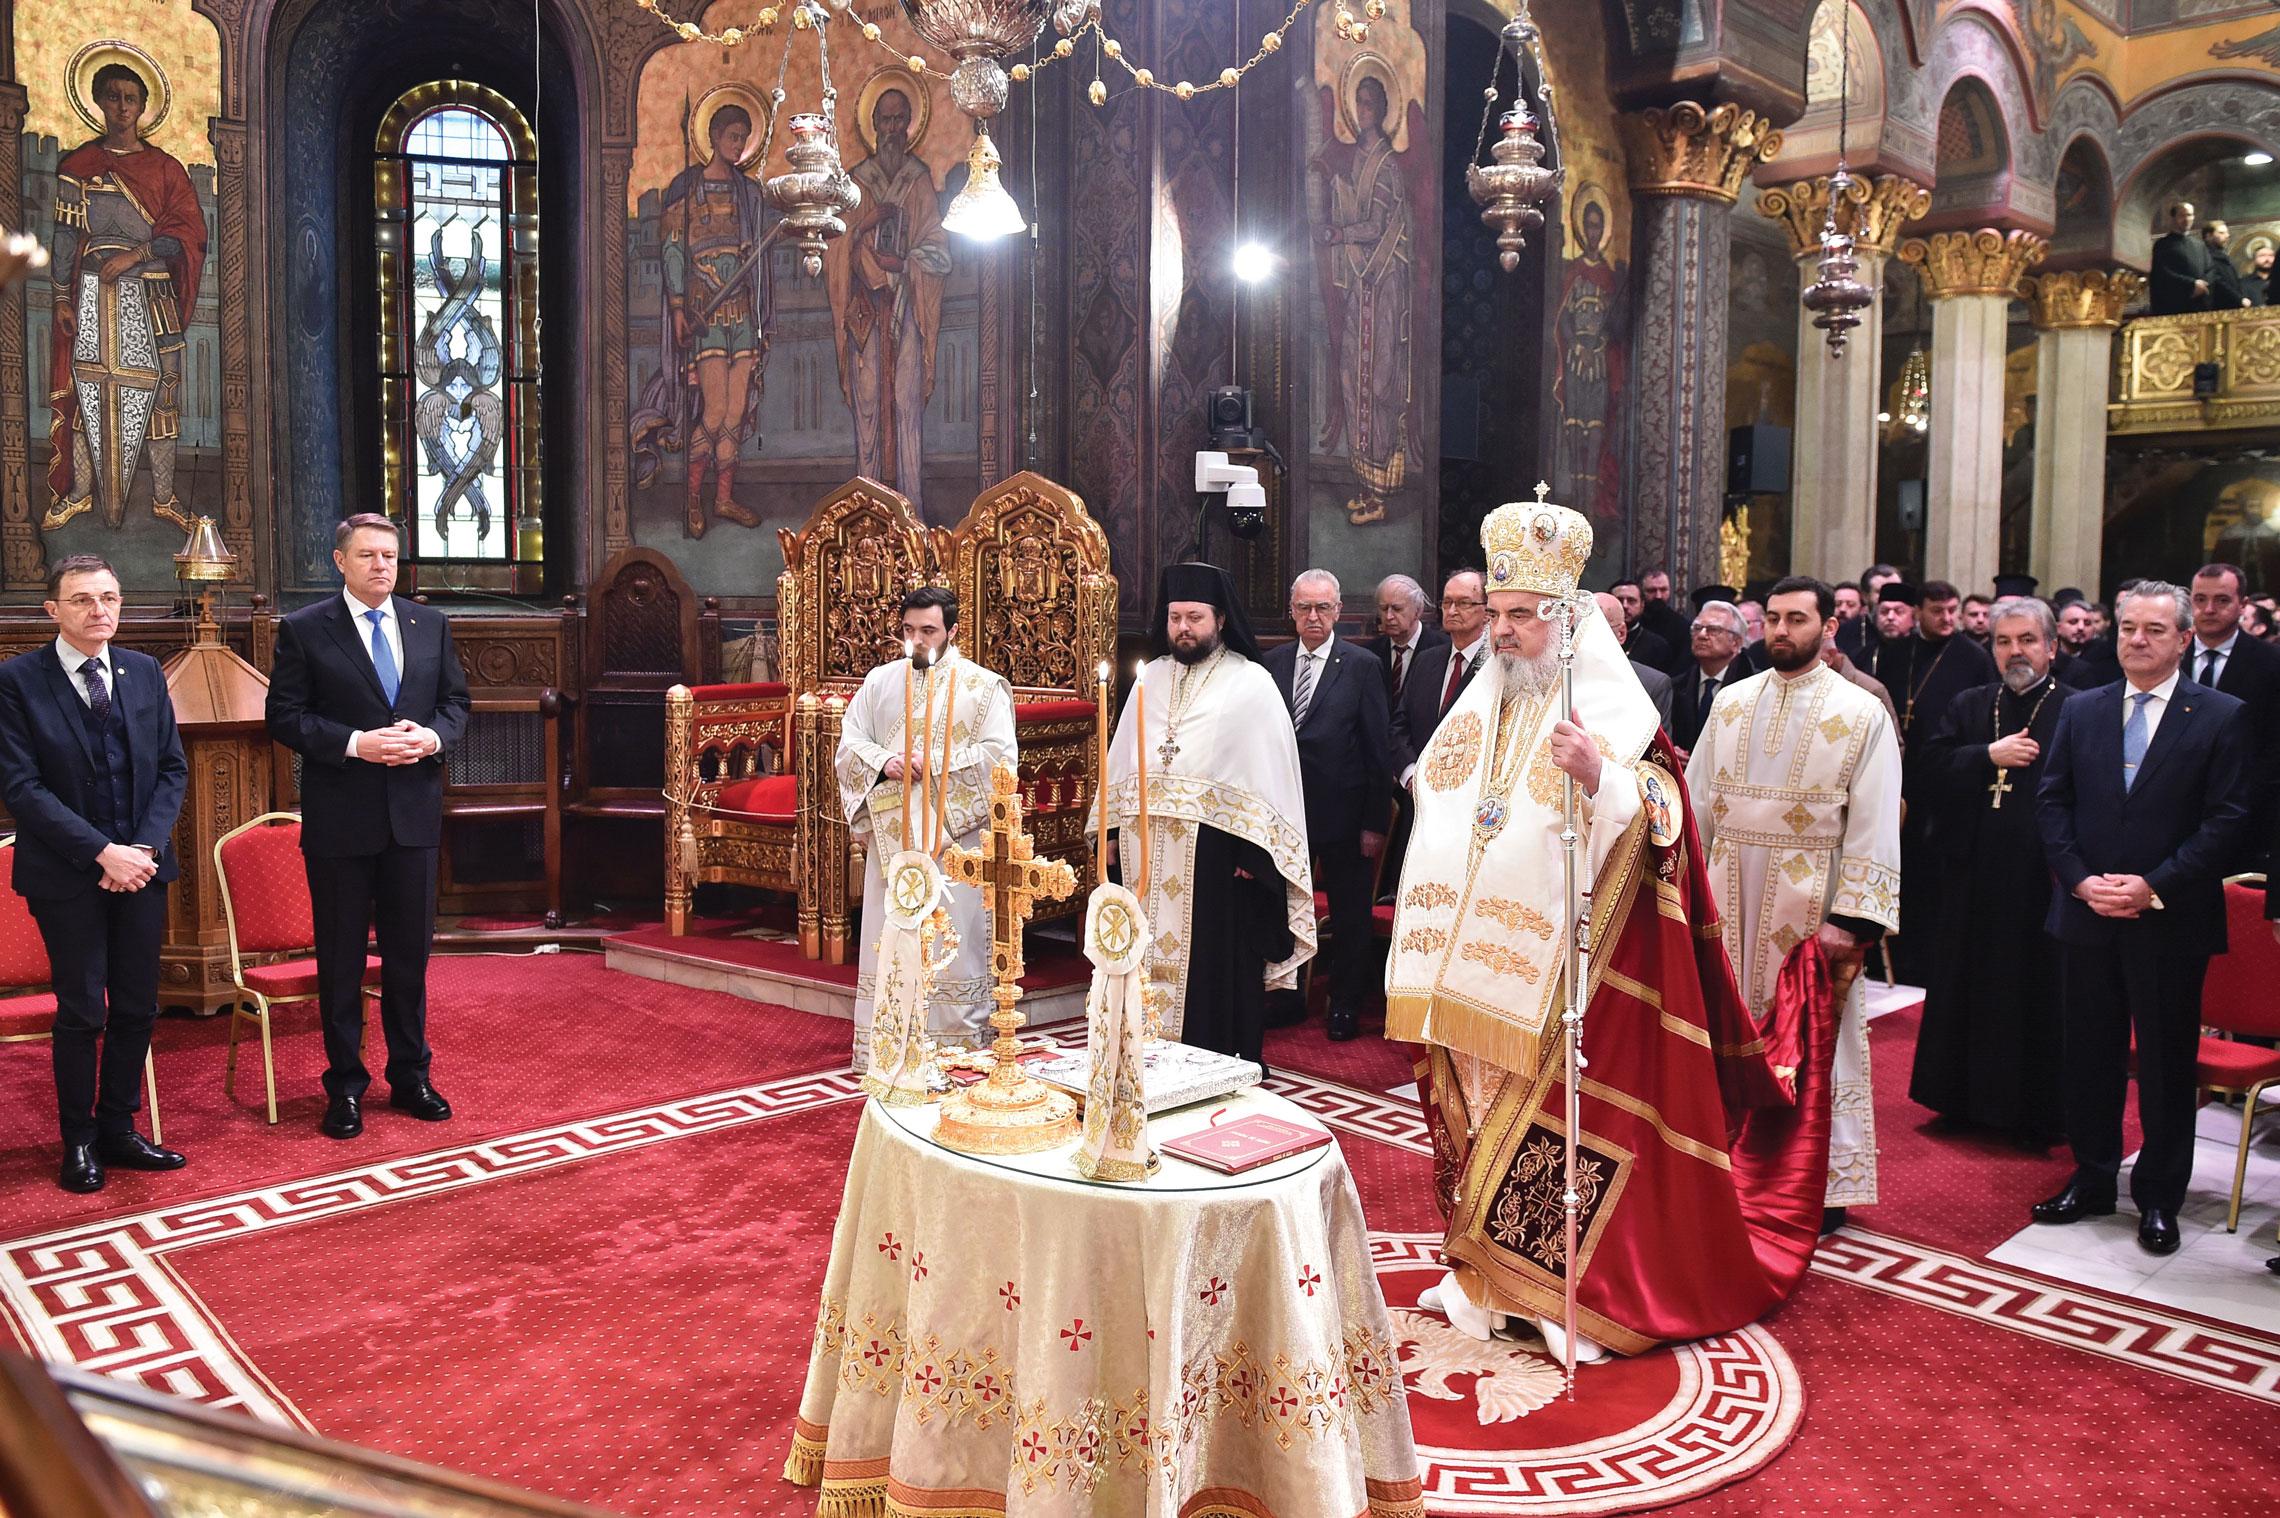 Unirea Principatelor Române, sărbătorită la Patriarhia Română